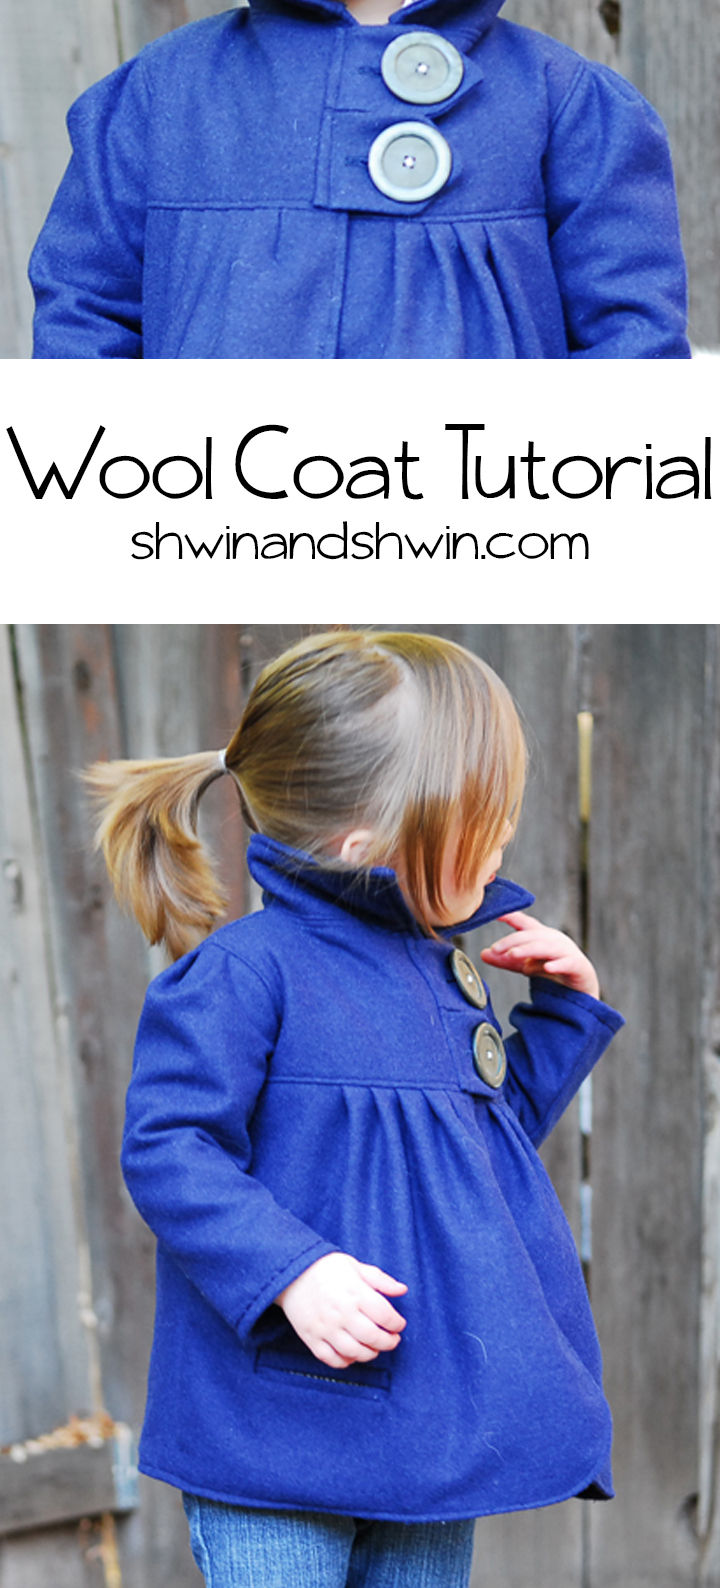 The Wool Coat